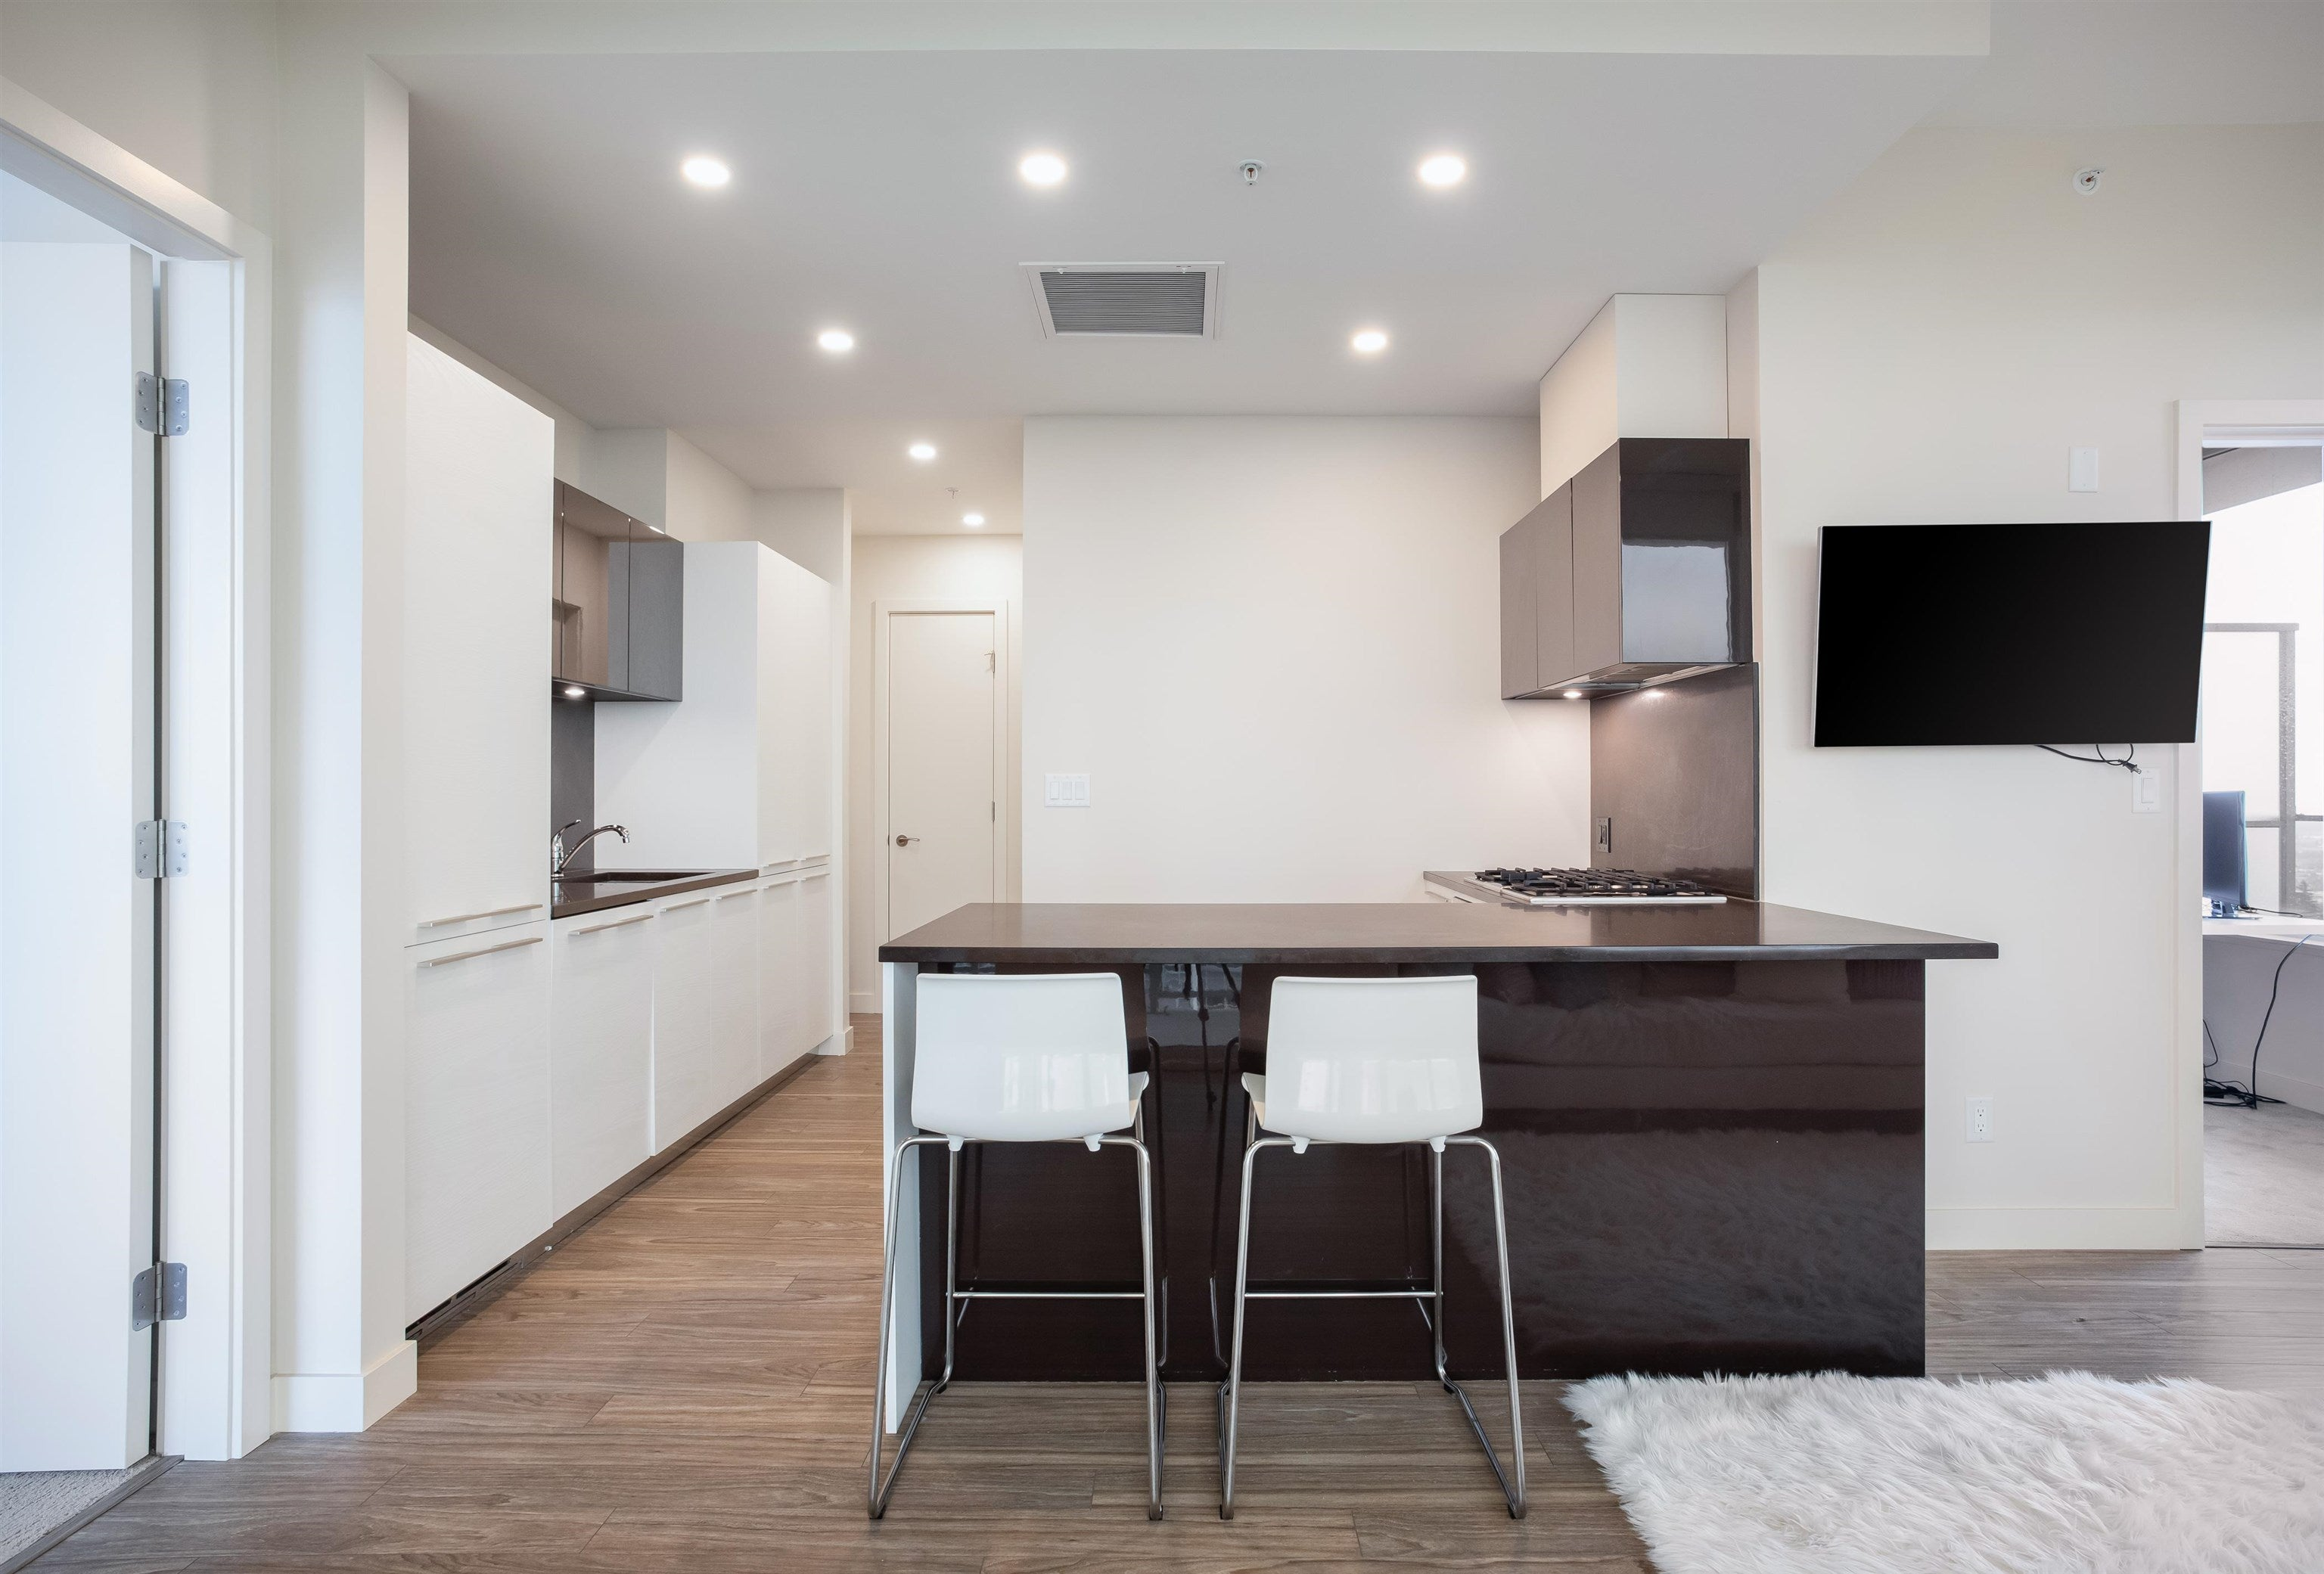 2206 6383 MCKAY AVENUE - Metrotown Apartment/Condo for sale, 2 Bedrooms (R2625647) - #8